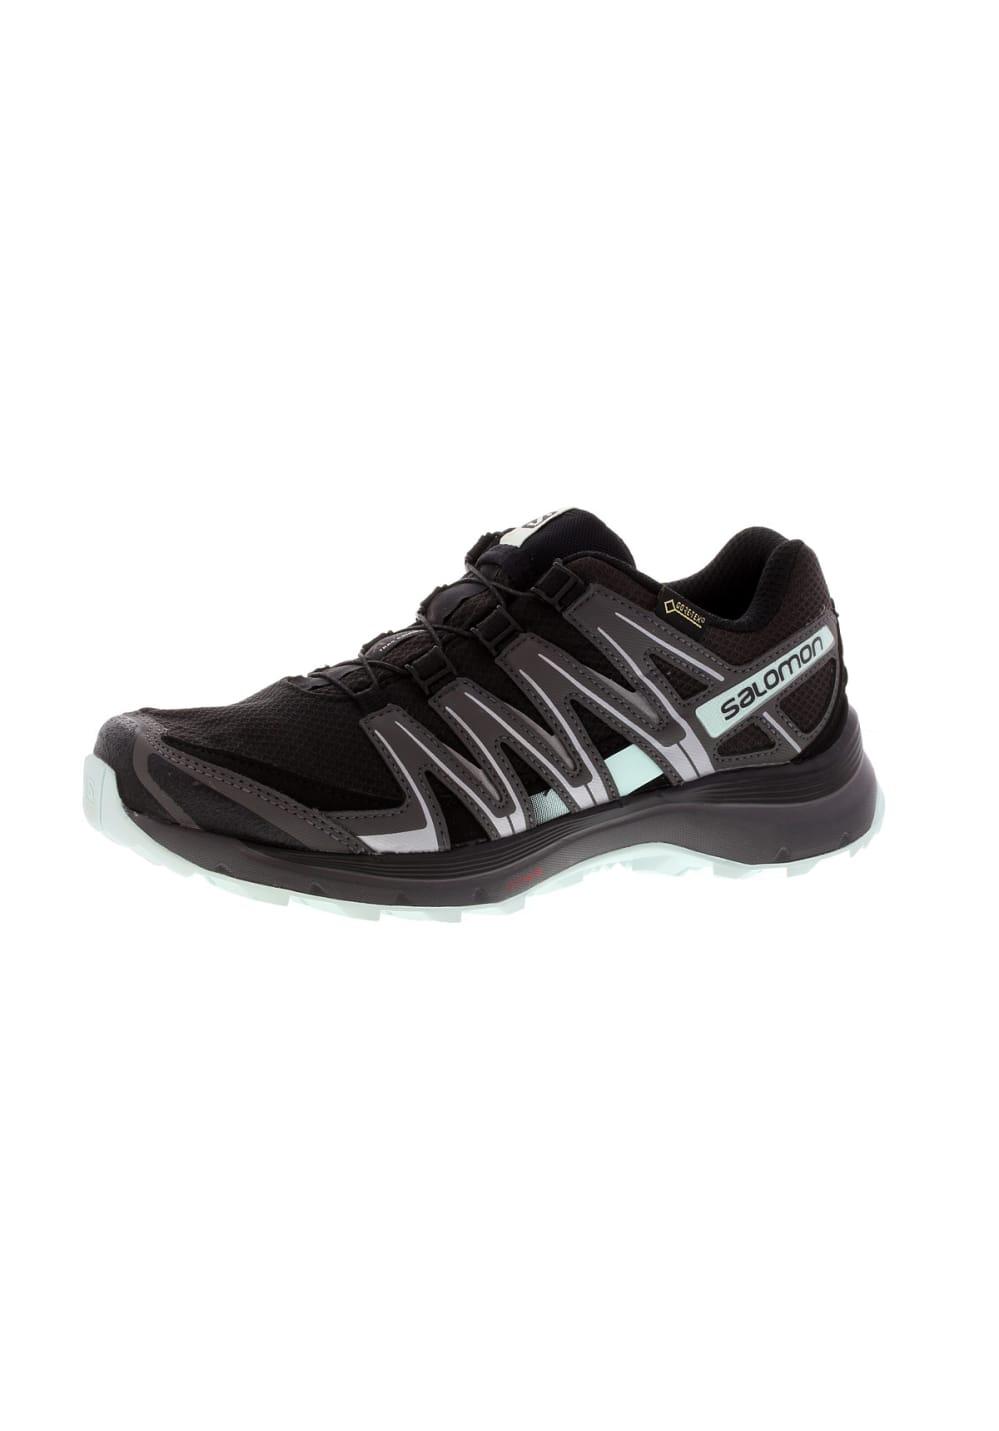 85cb1772 Salomon XA Lite GTX - Running shoes for Women - Black | 21RUN